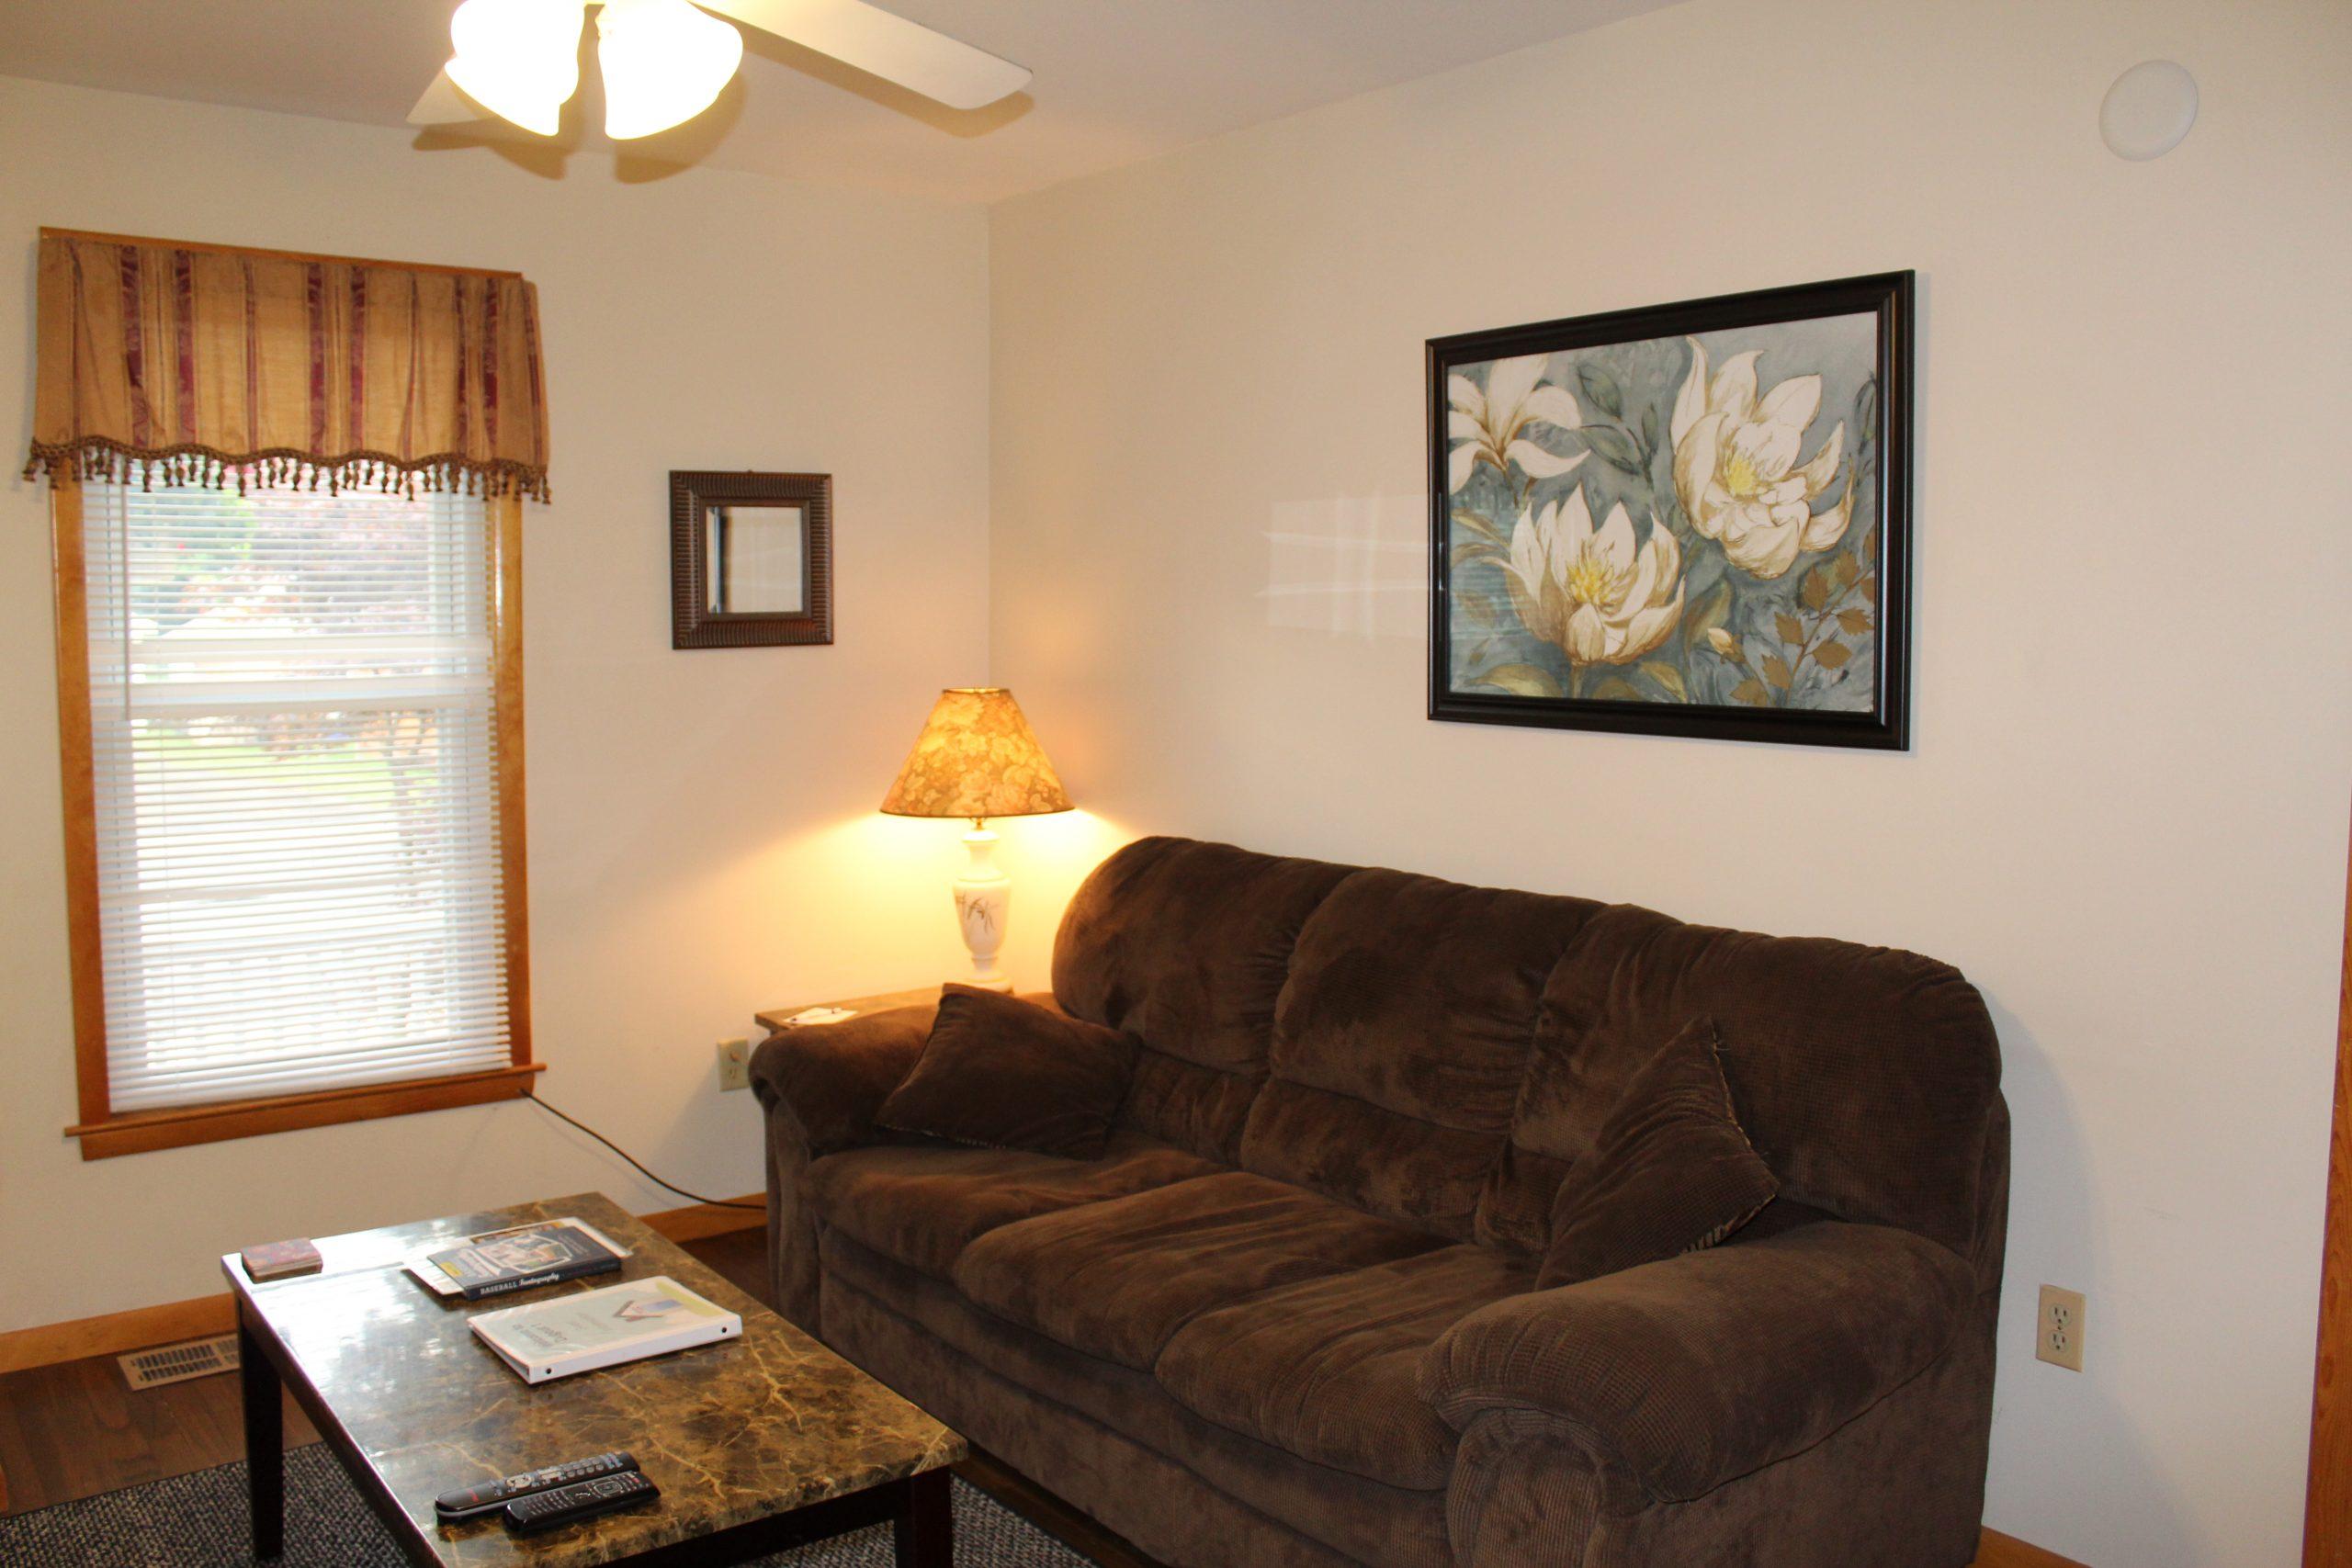 48 Miller Street #1A, a first floor 1 bedroom apartment